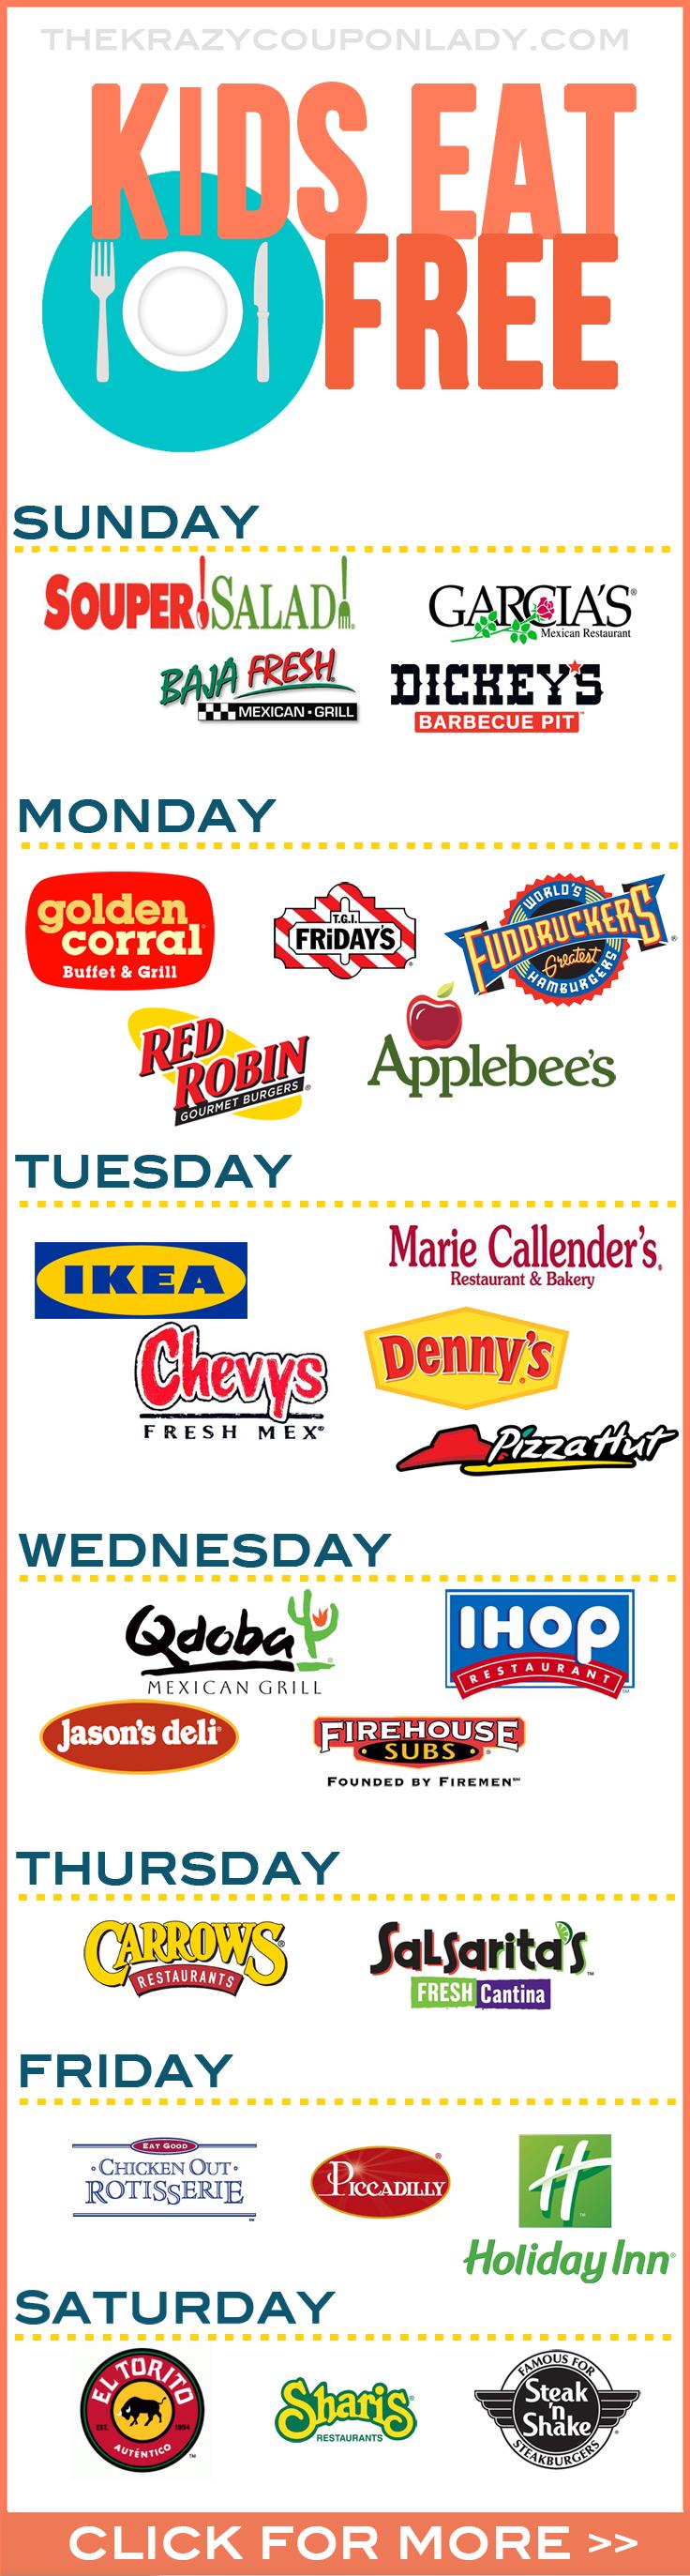 Super comprehensive list of restaurants where kids eat FREE!